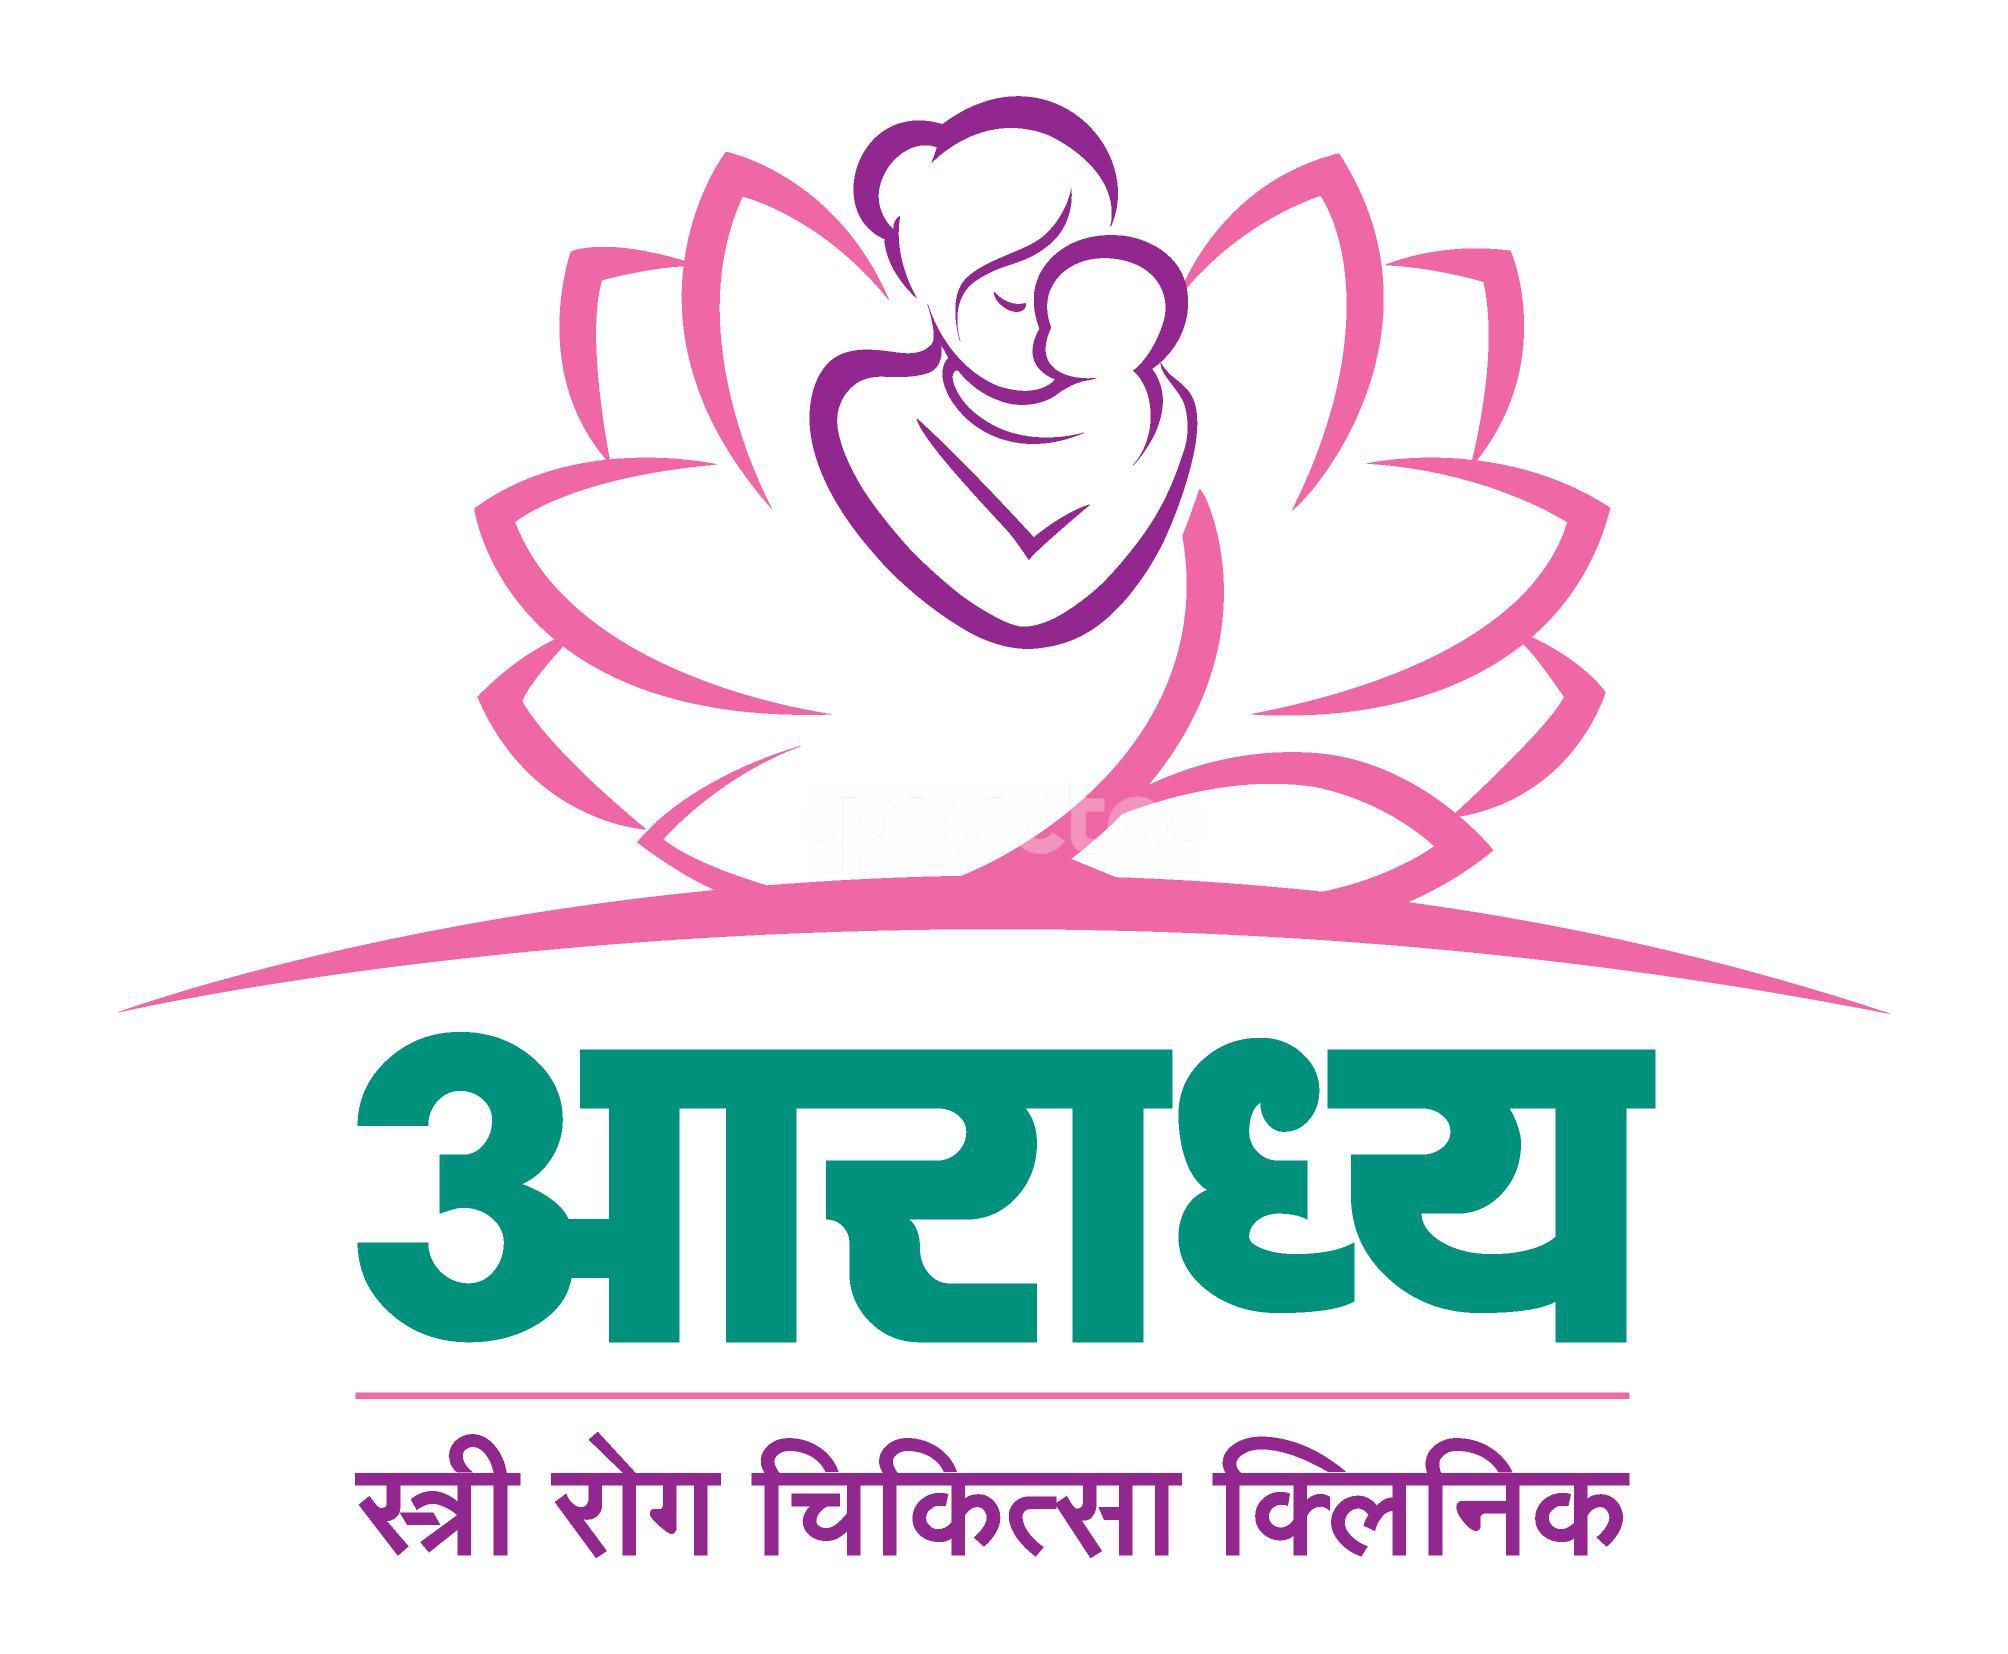 Aaradhya Women's Clinic display image